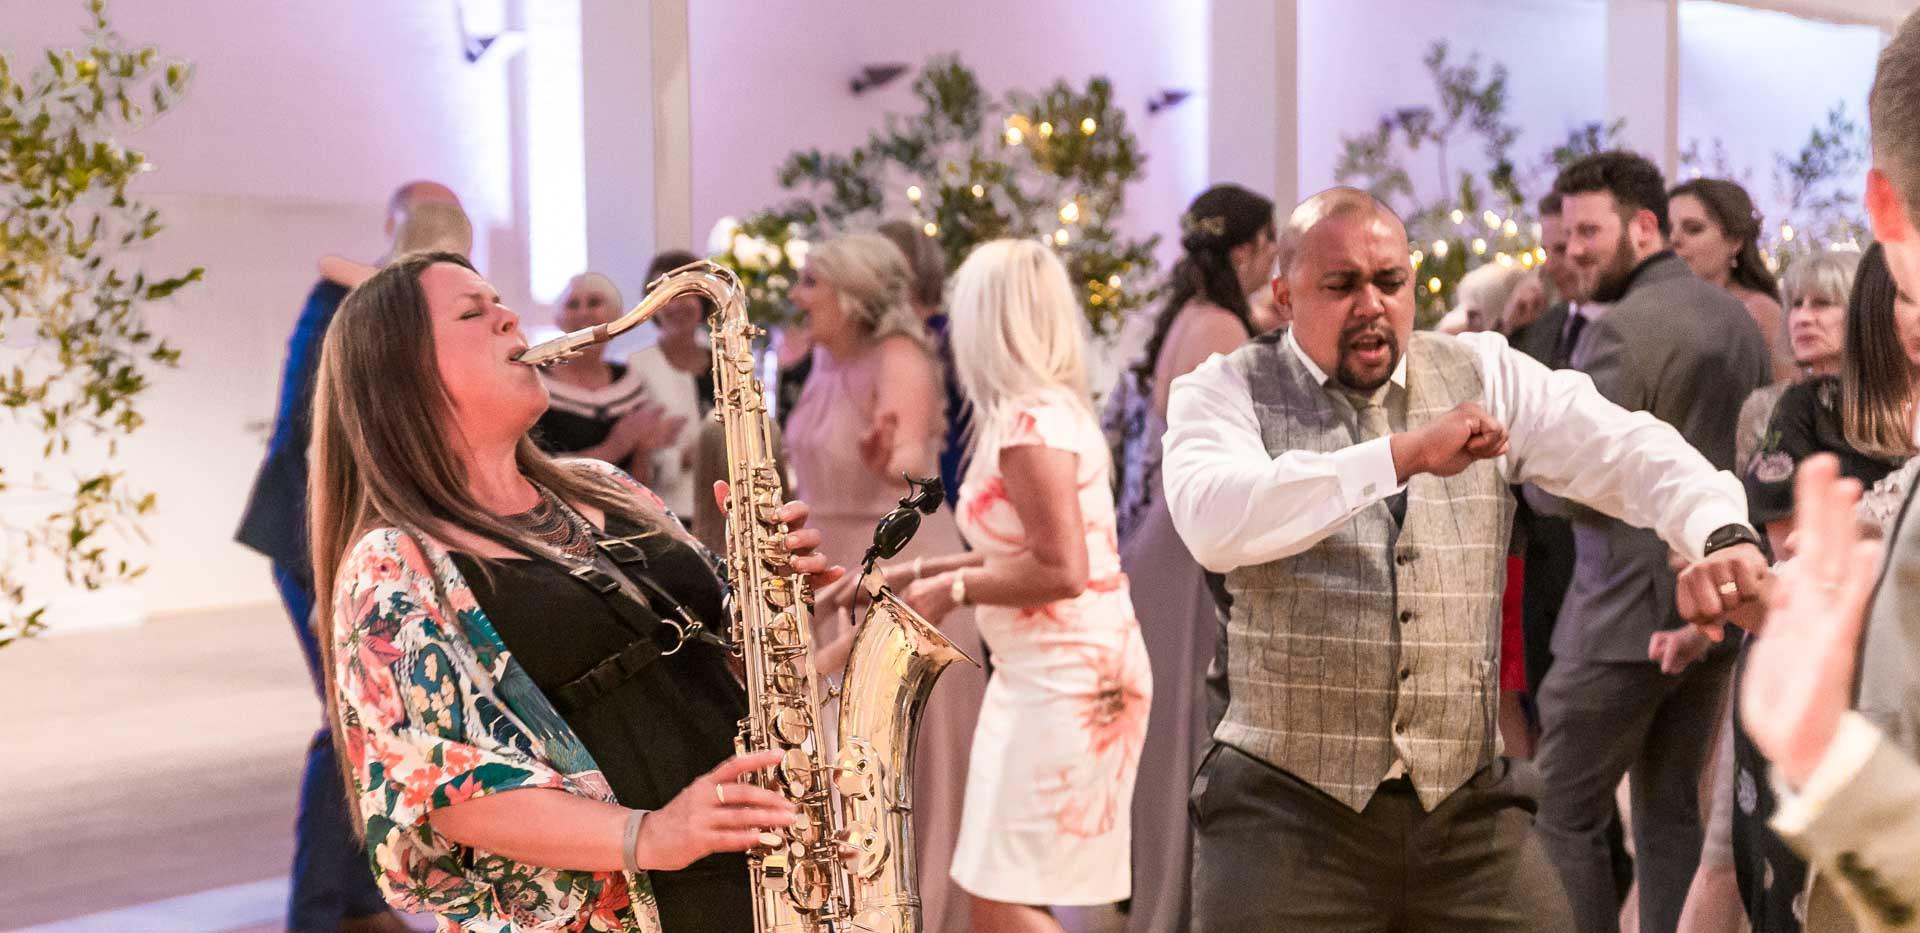 Caron Robinson, Saxophonist for Playback